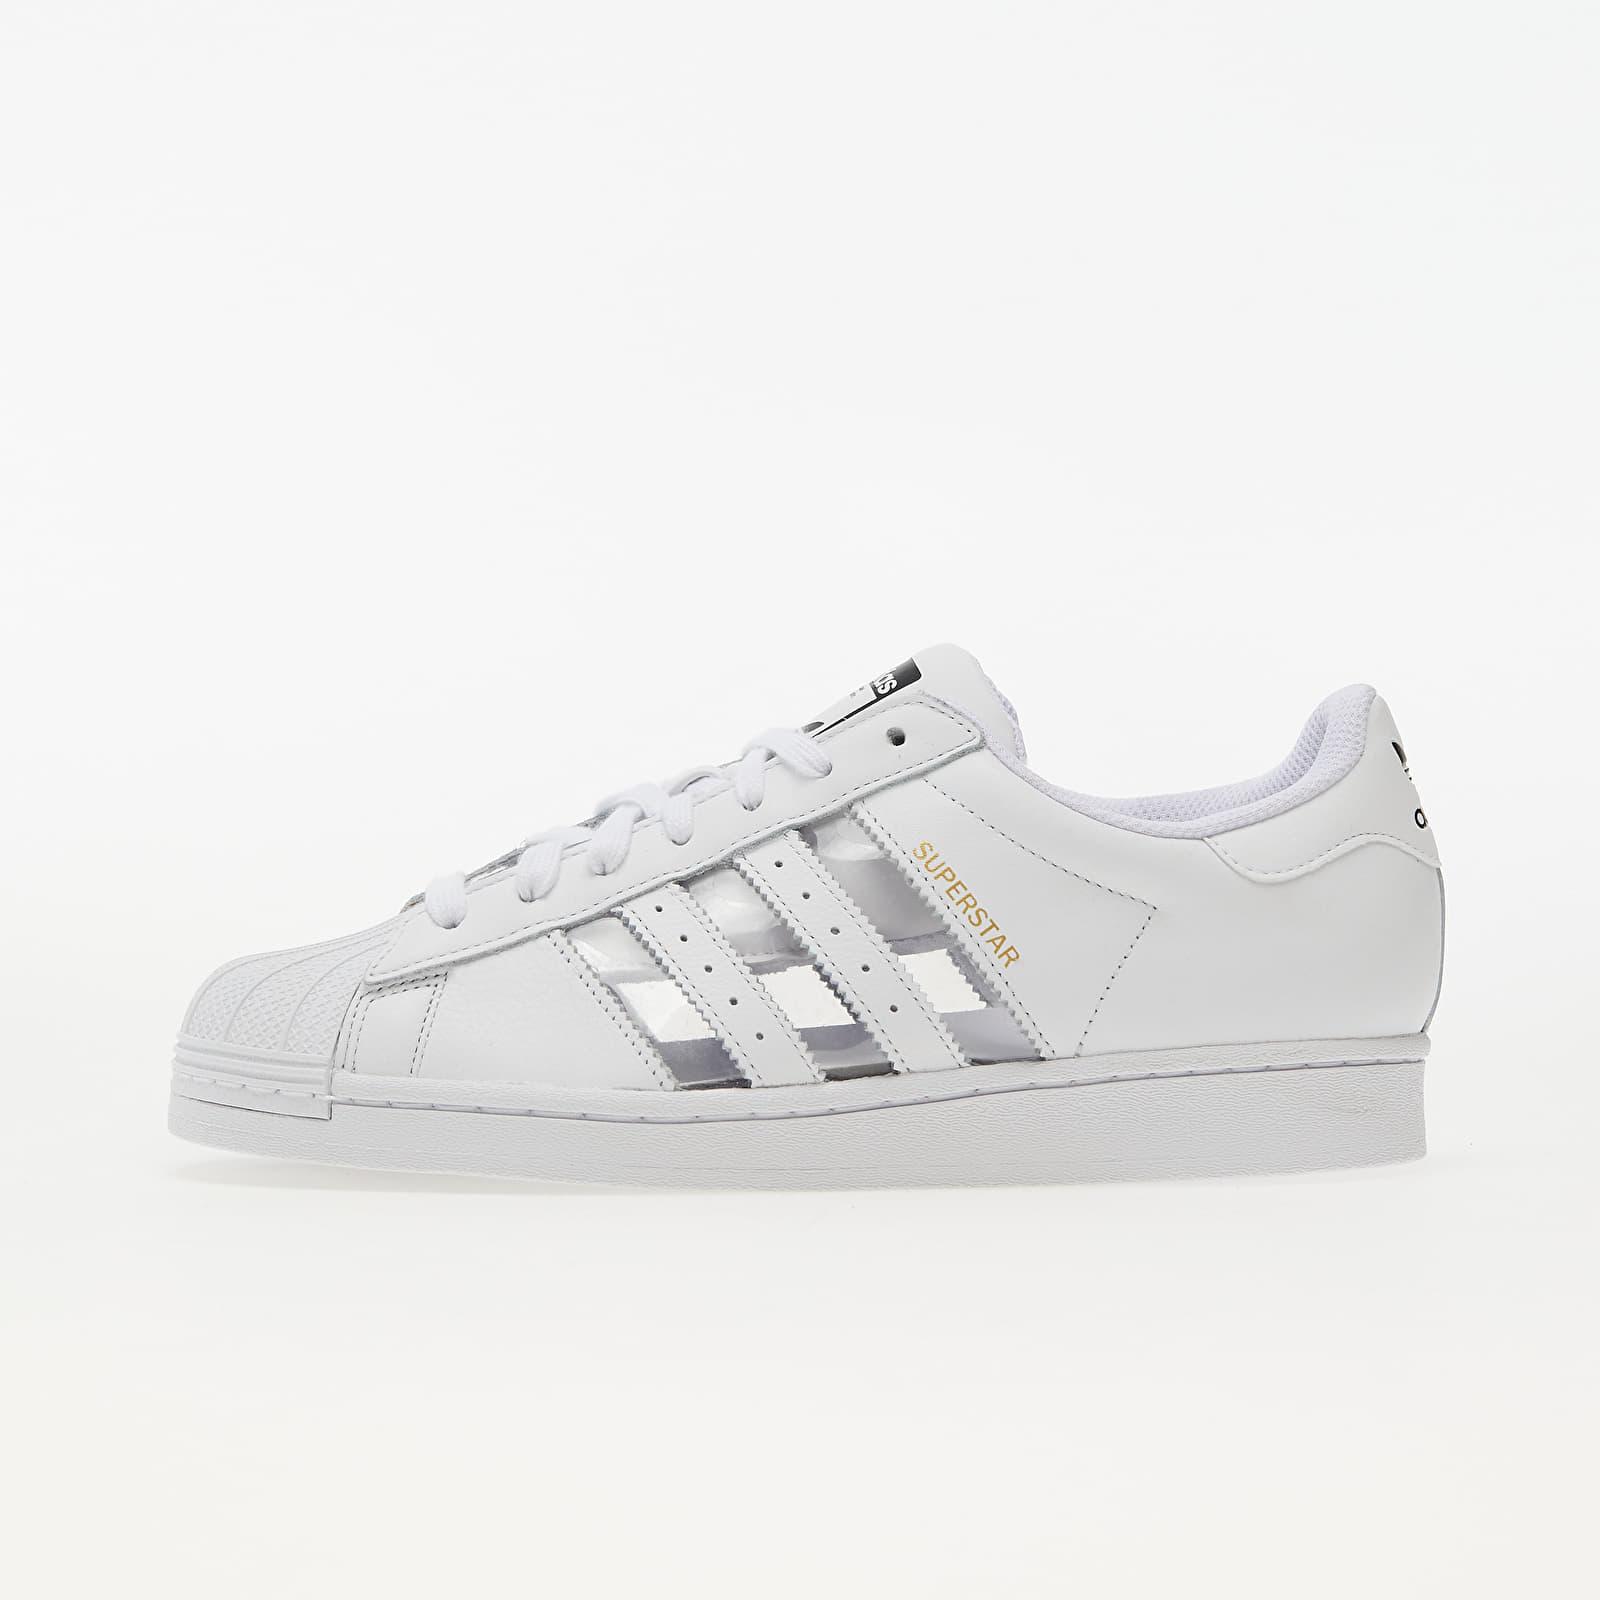 adidas Superstar Ftw White/ Supplier Color/ Core Black FY7717